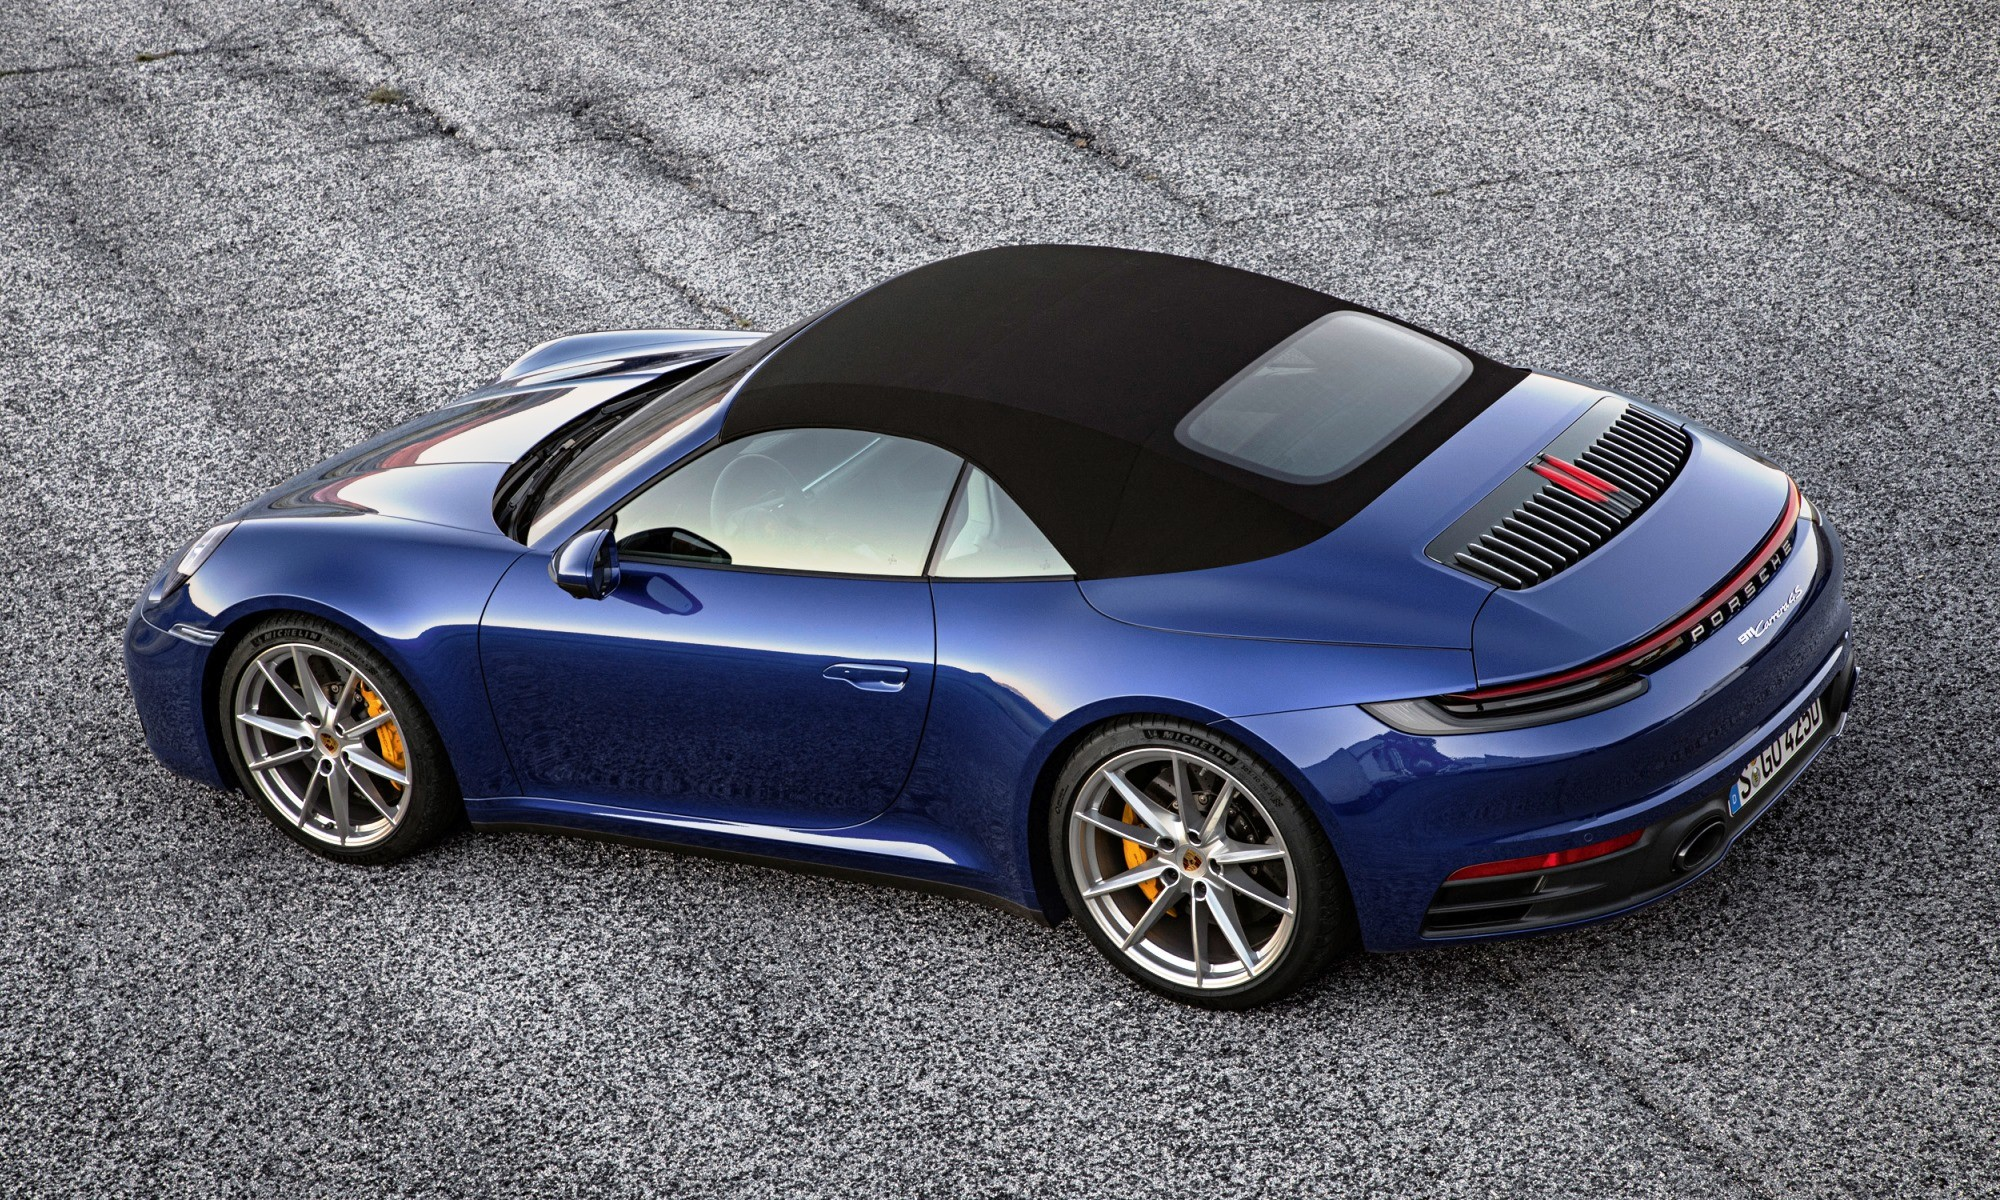 New Porsche 911 Cabriolet roof up